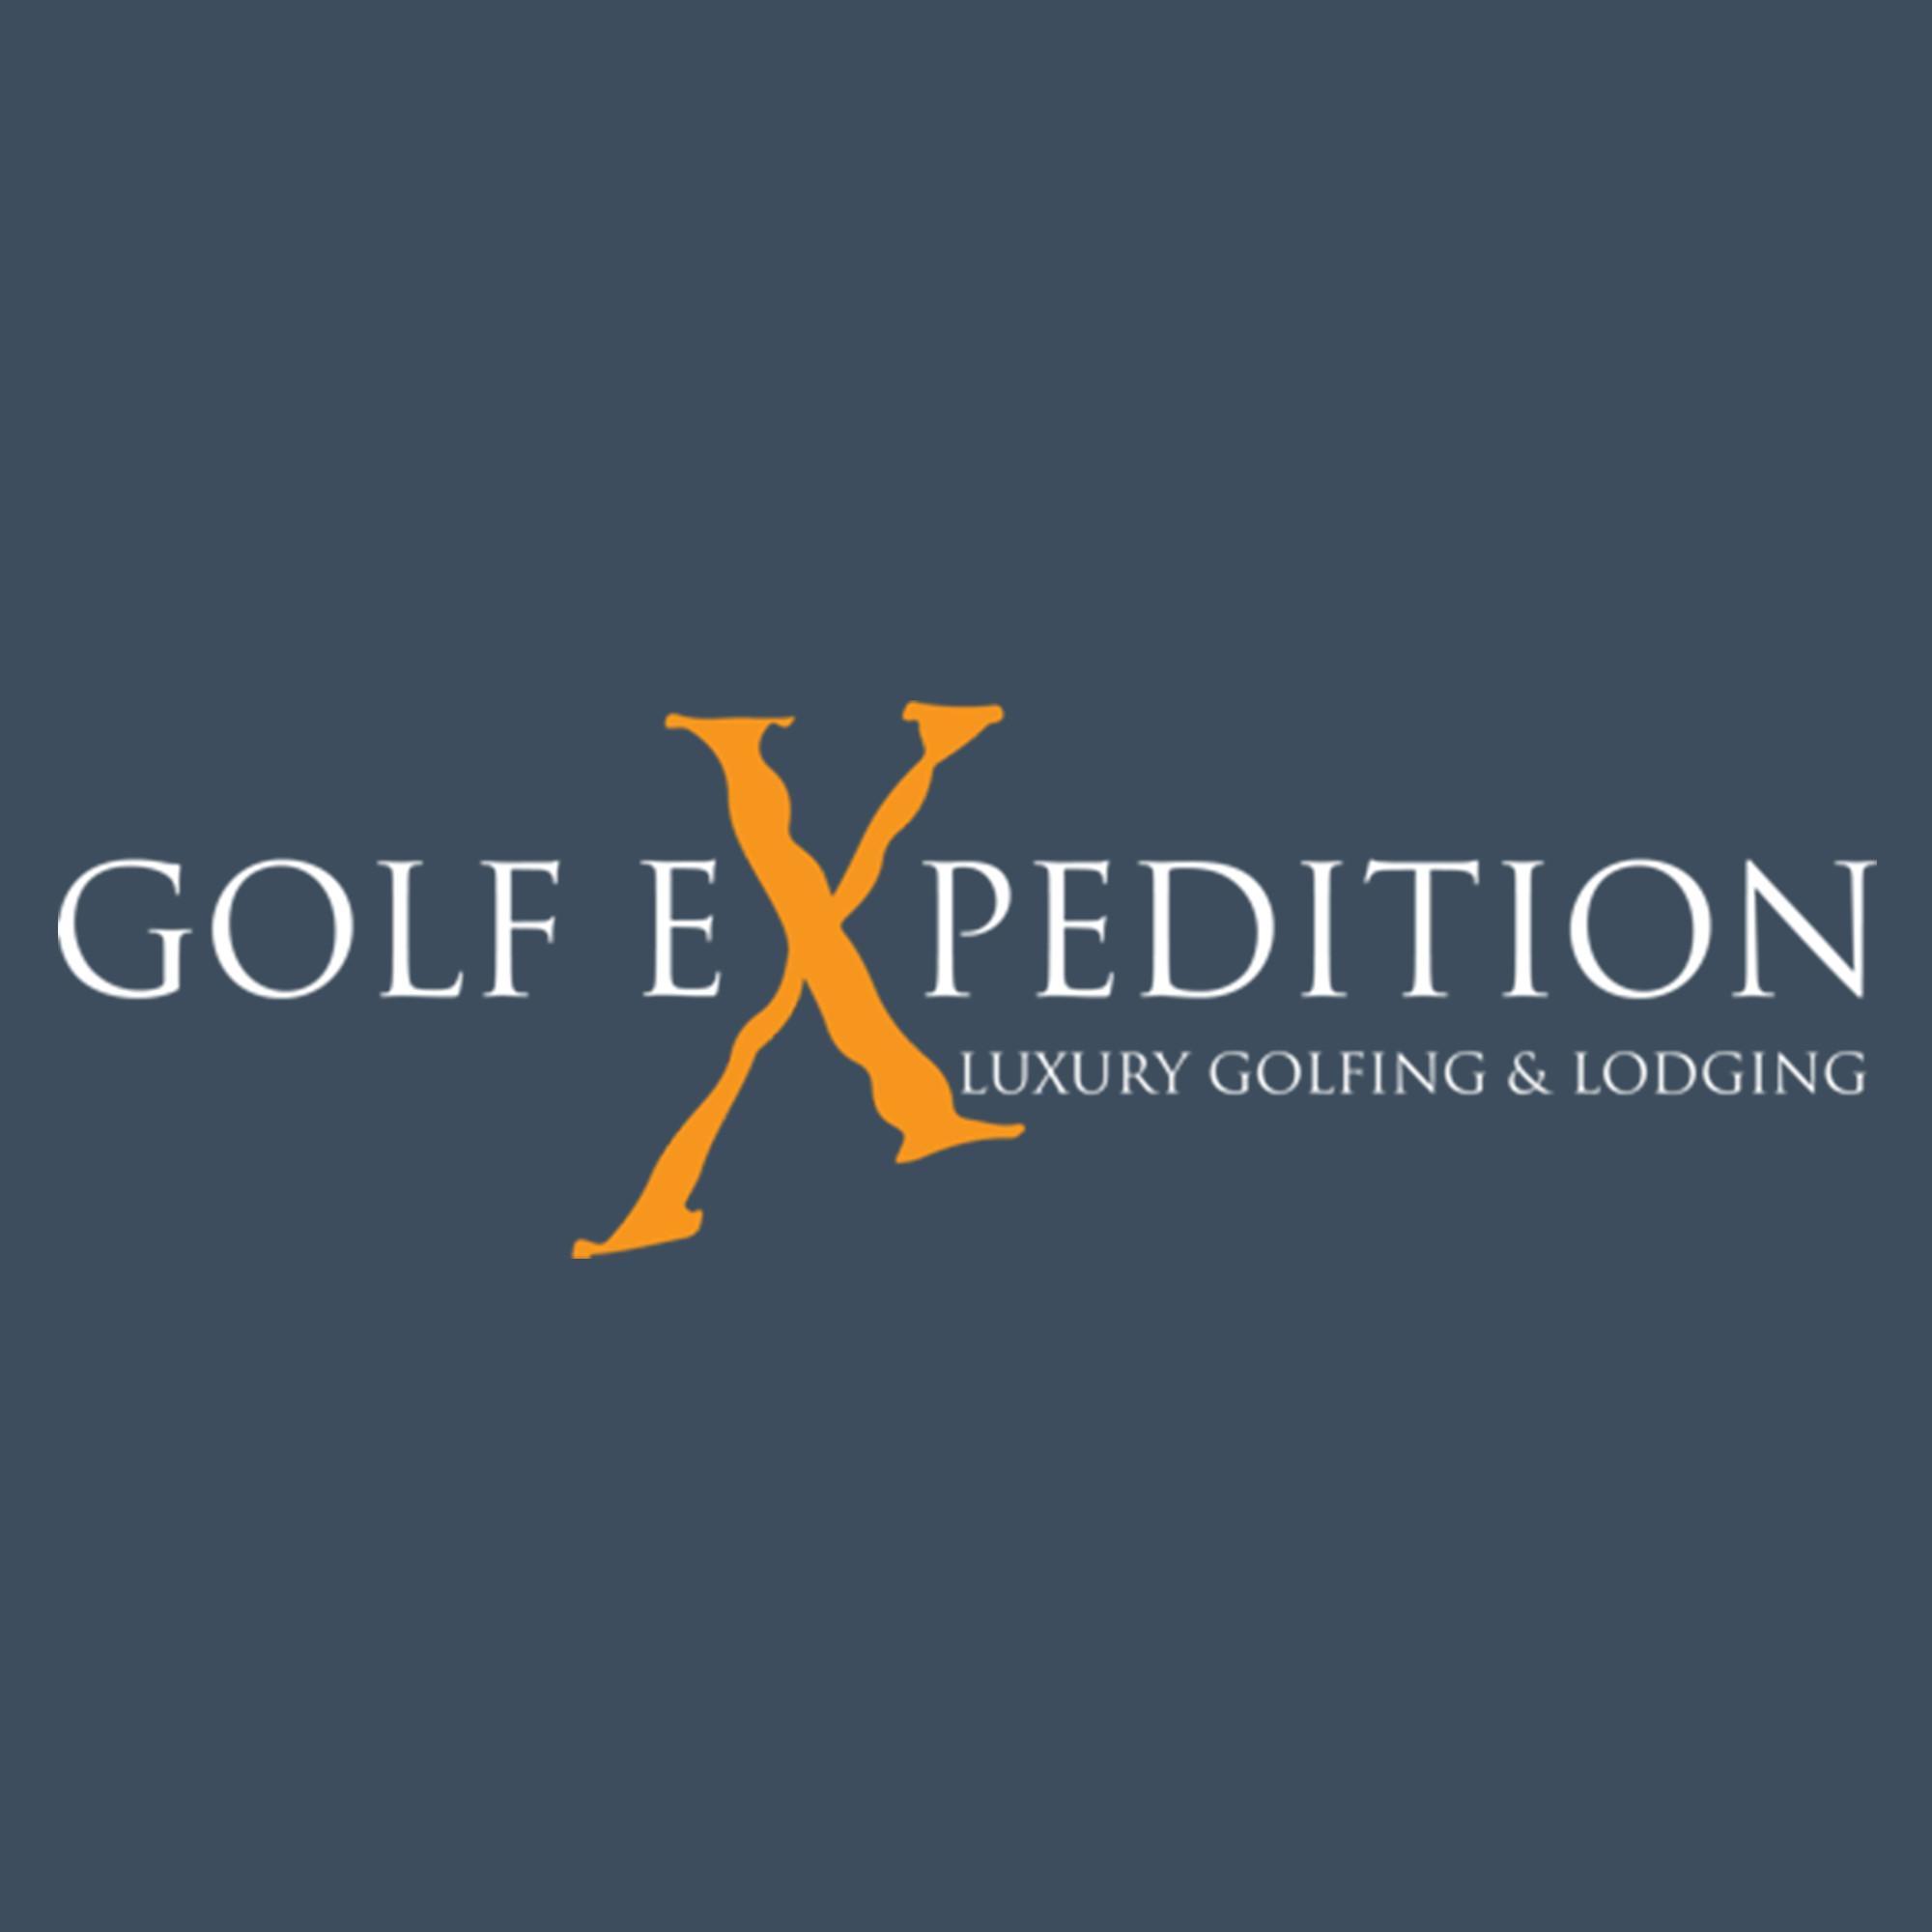 golf-expedition-online-marketing-bureau-webdevelopment-haarlem-made-marketing-5